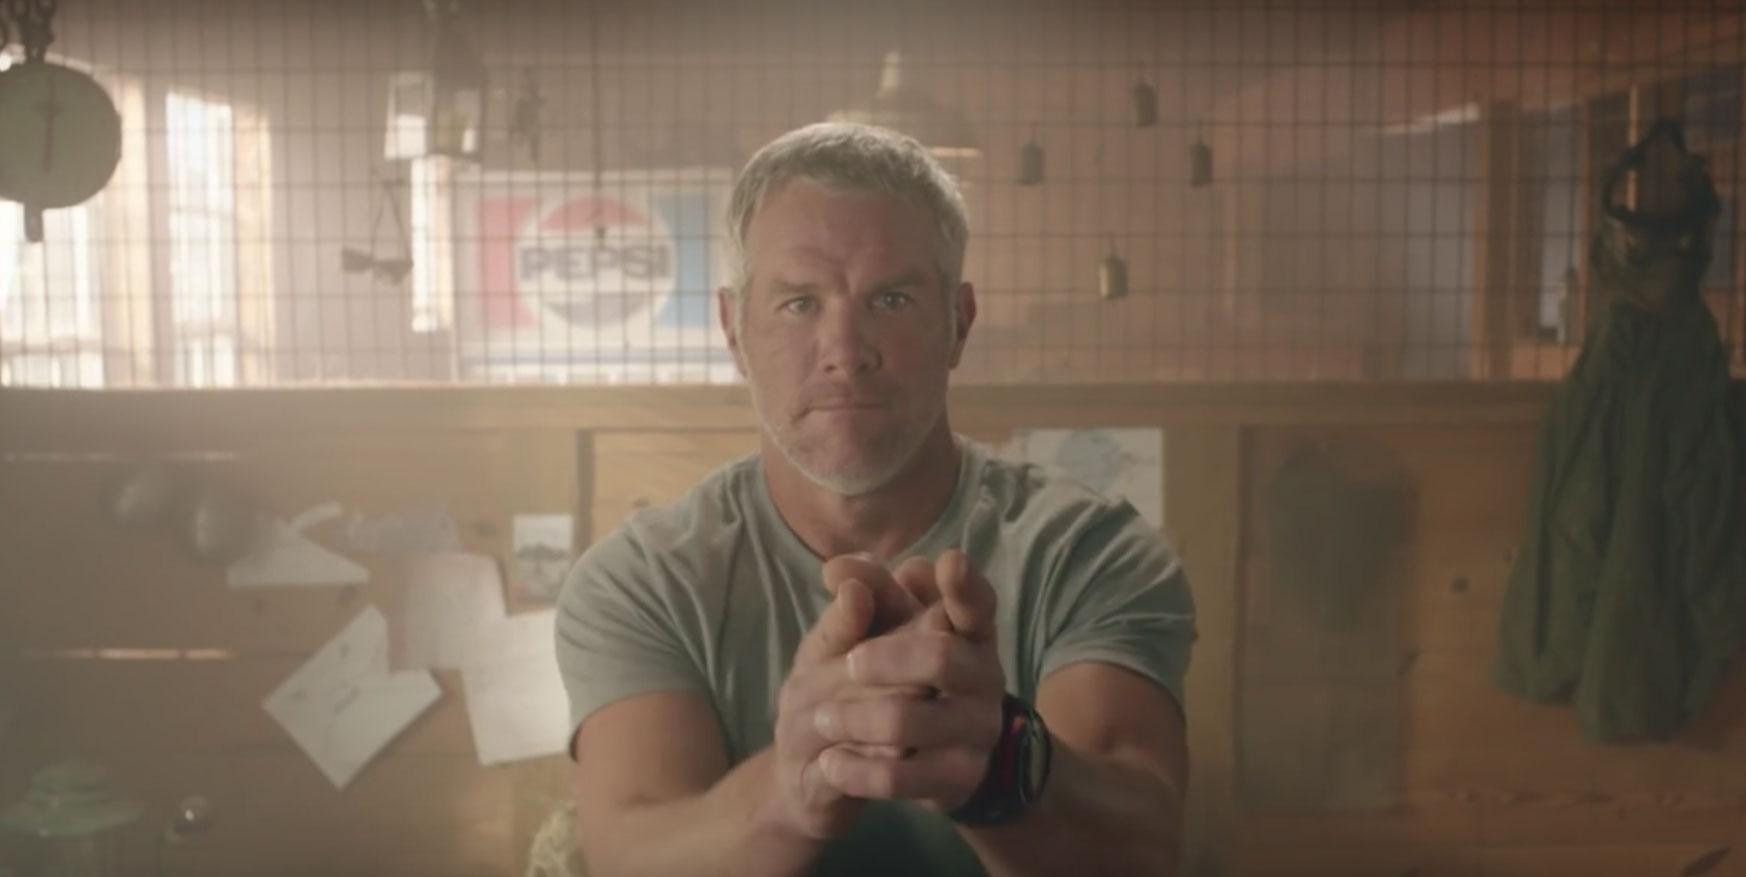 Buffalo Wild Wings Super Bowl Commercial 2017: Brett Farve ... | 1746 x 877 jpeg 91kB